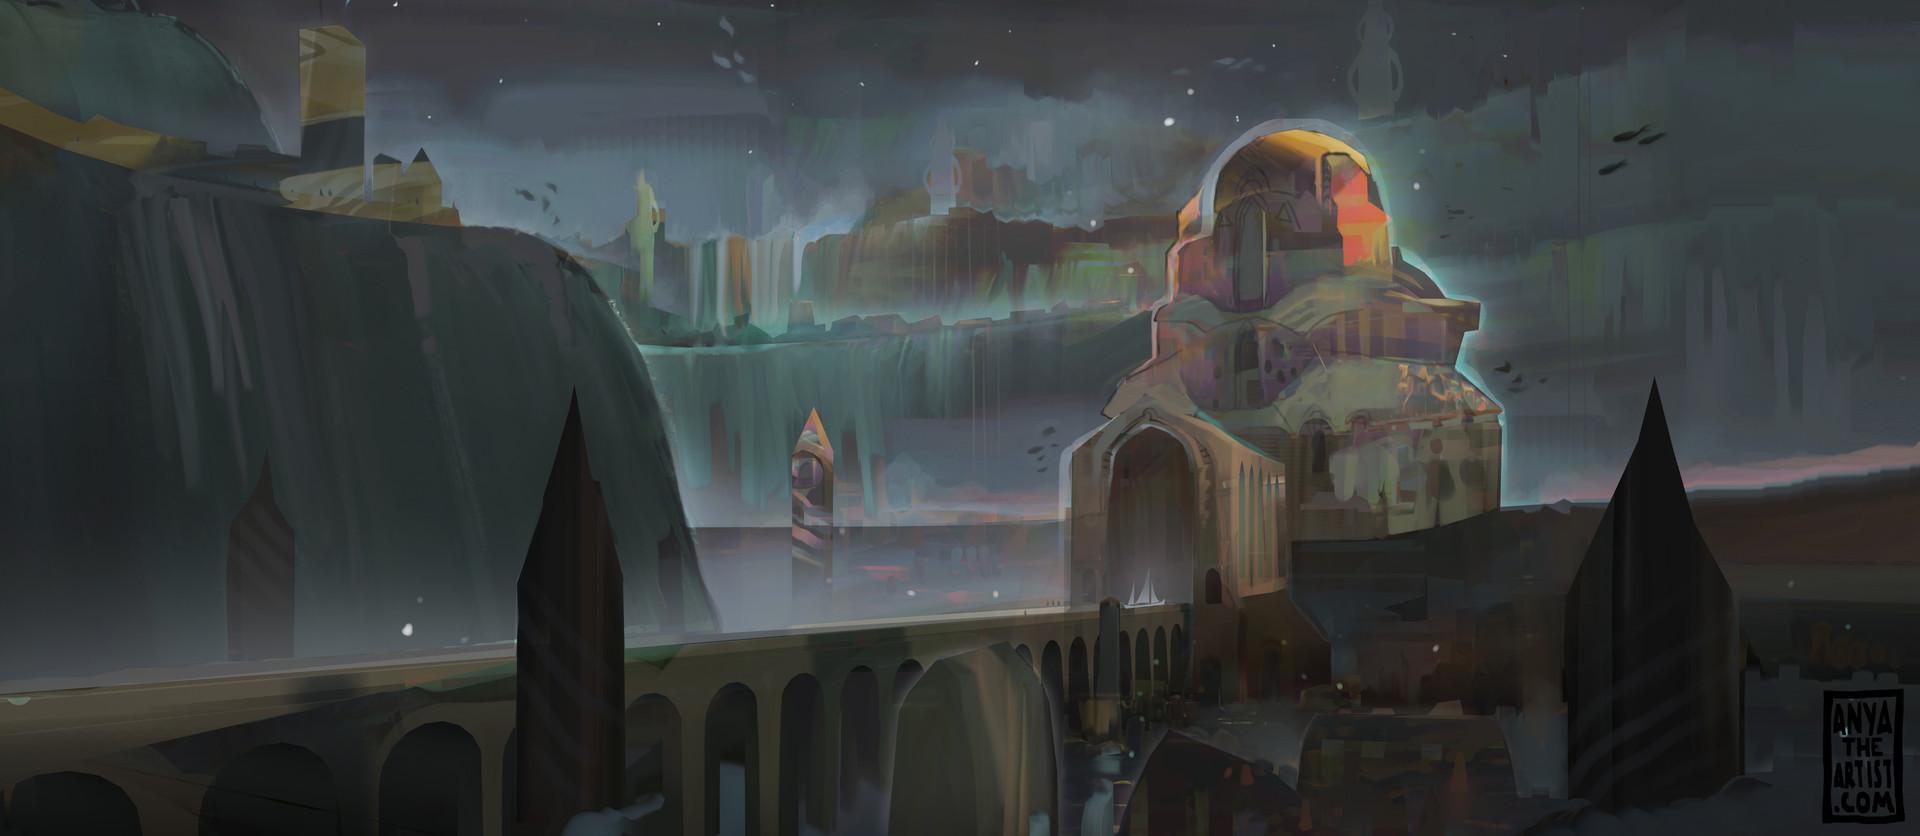 Anya elvidge magical city 1